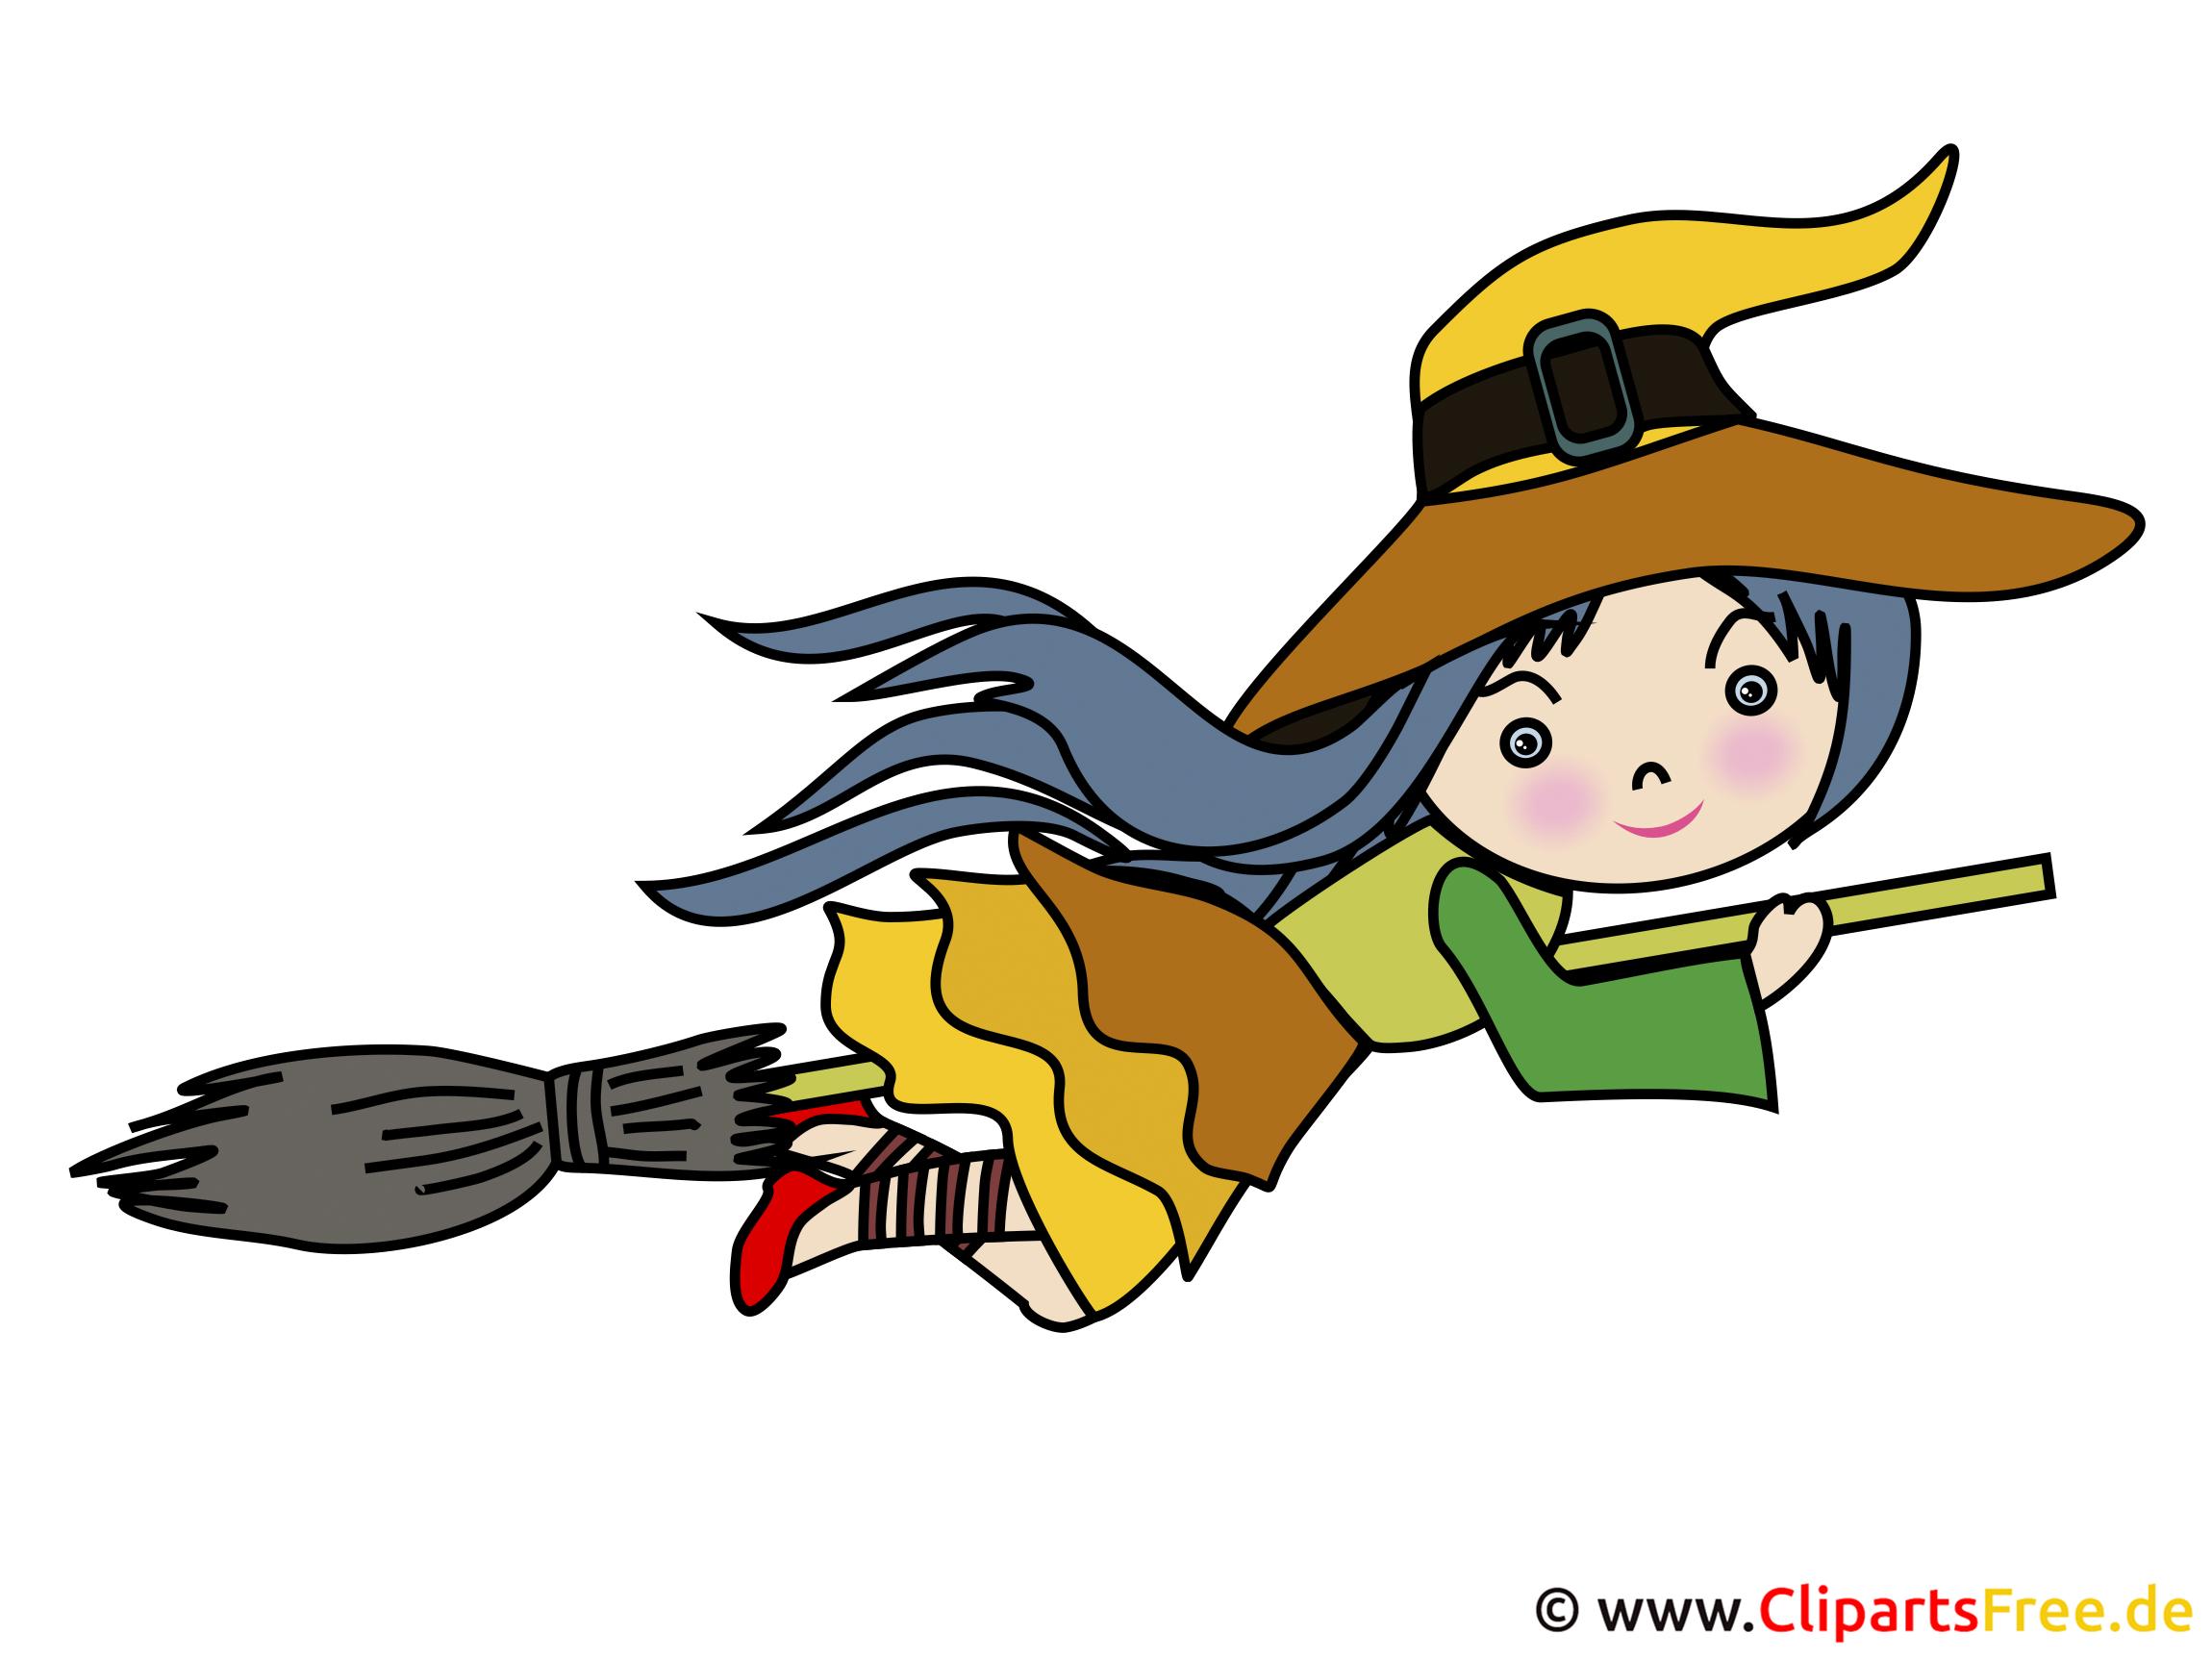 clipart halloween hexen - photo #10